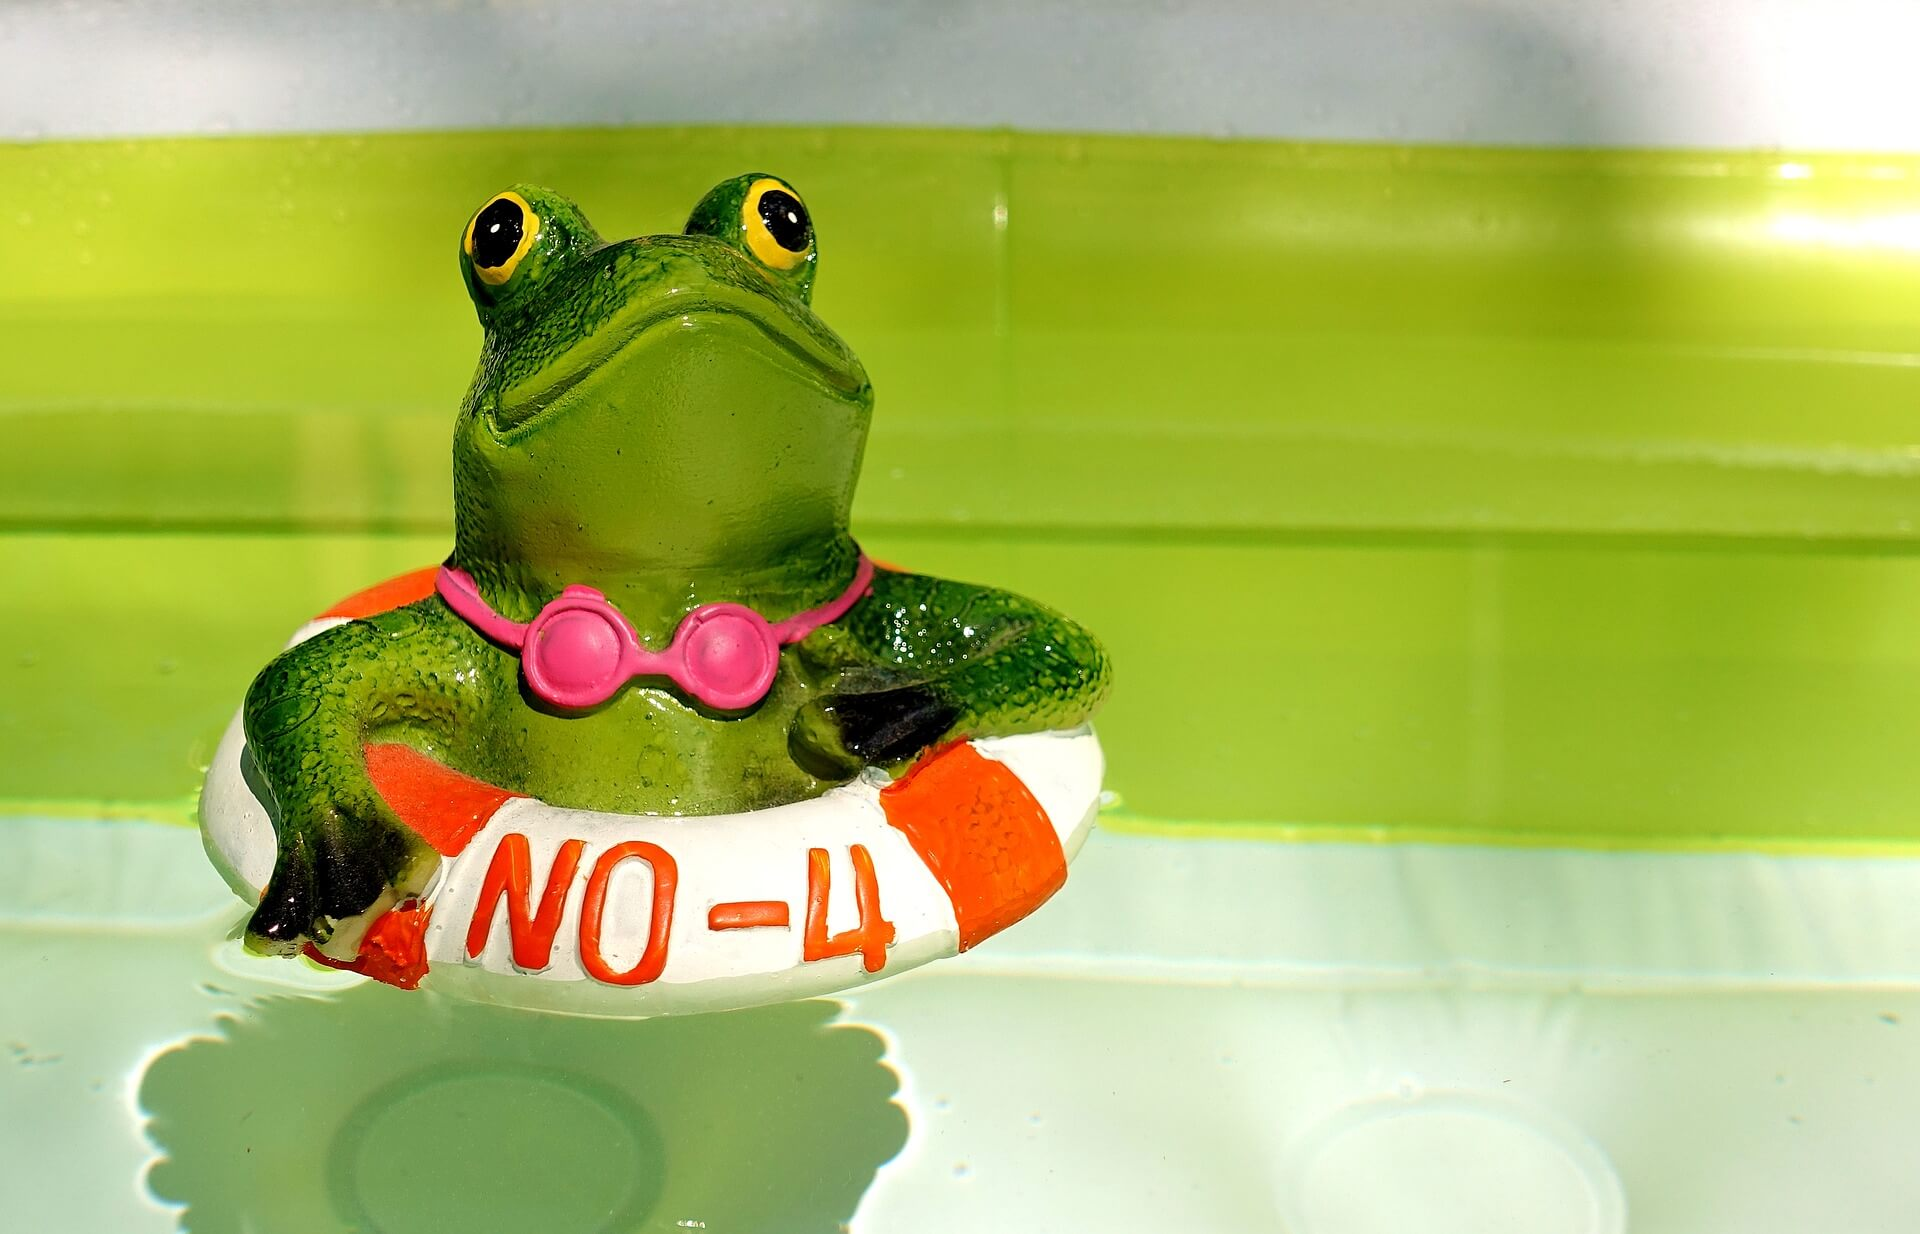 frog-3541851_1920